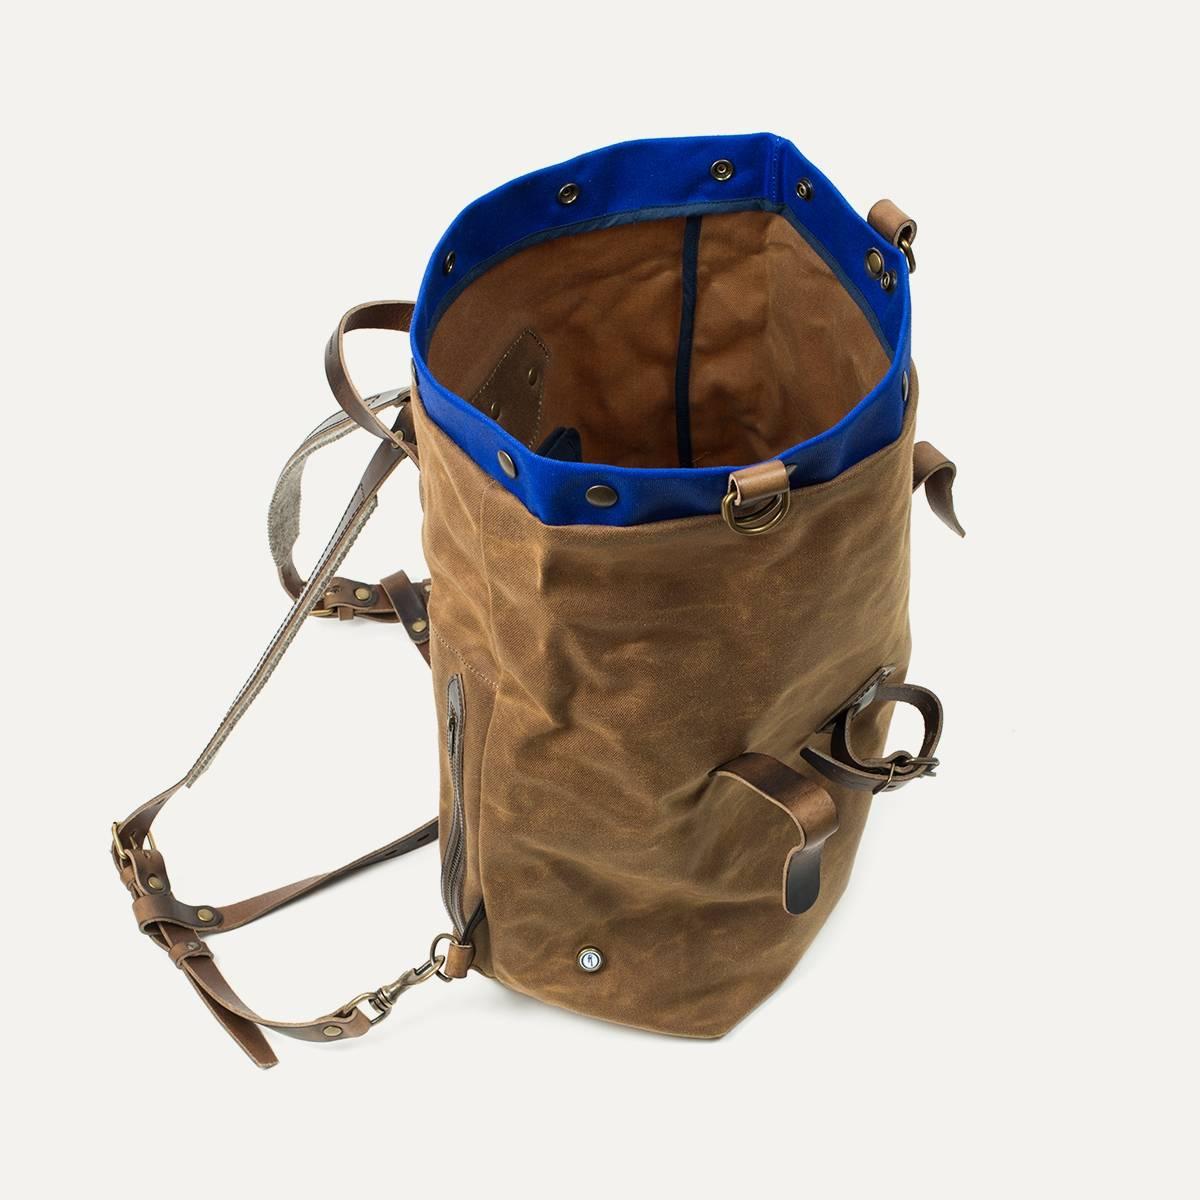 sac dos scout blitz mortorcycles bleu de chauffe. Black Bedroom Furniture Sets. Home Design Ideas